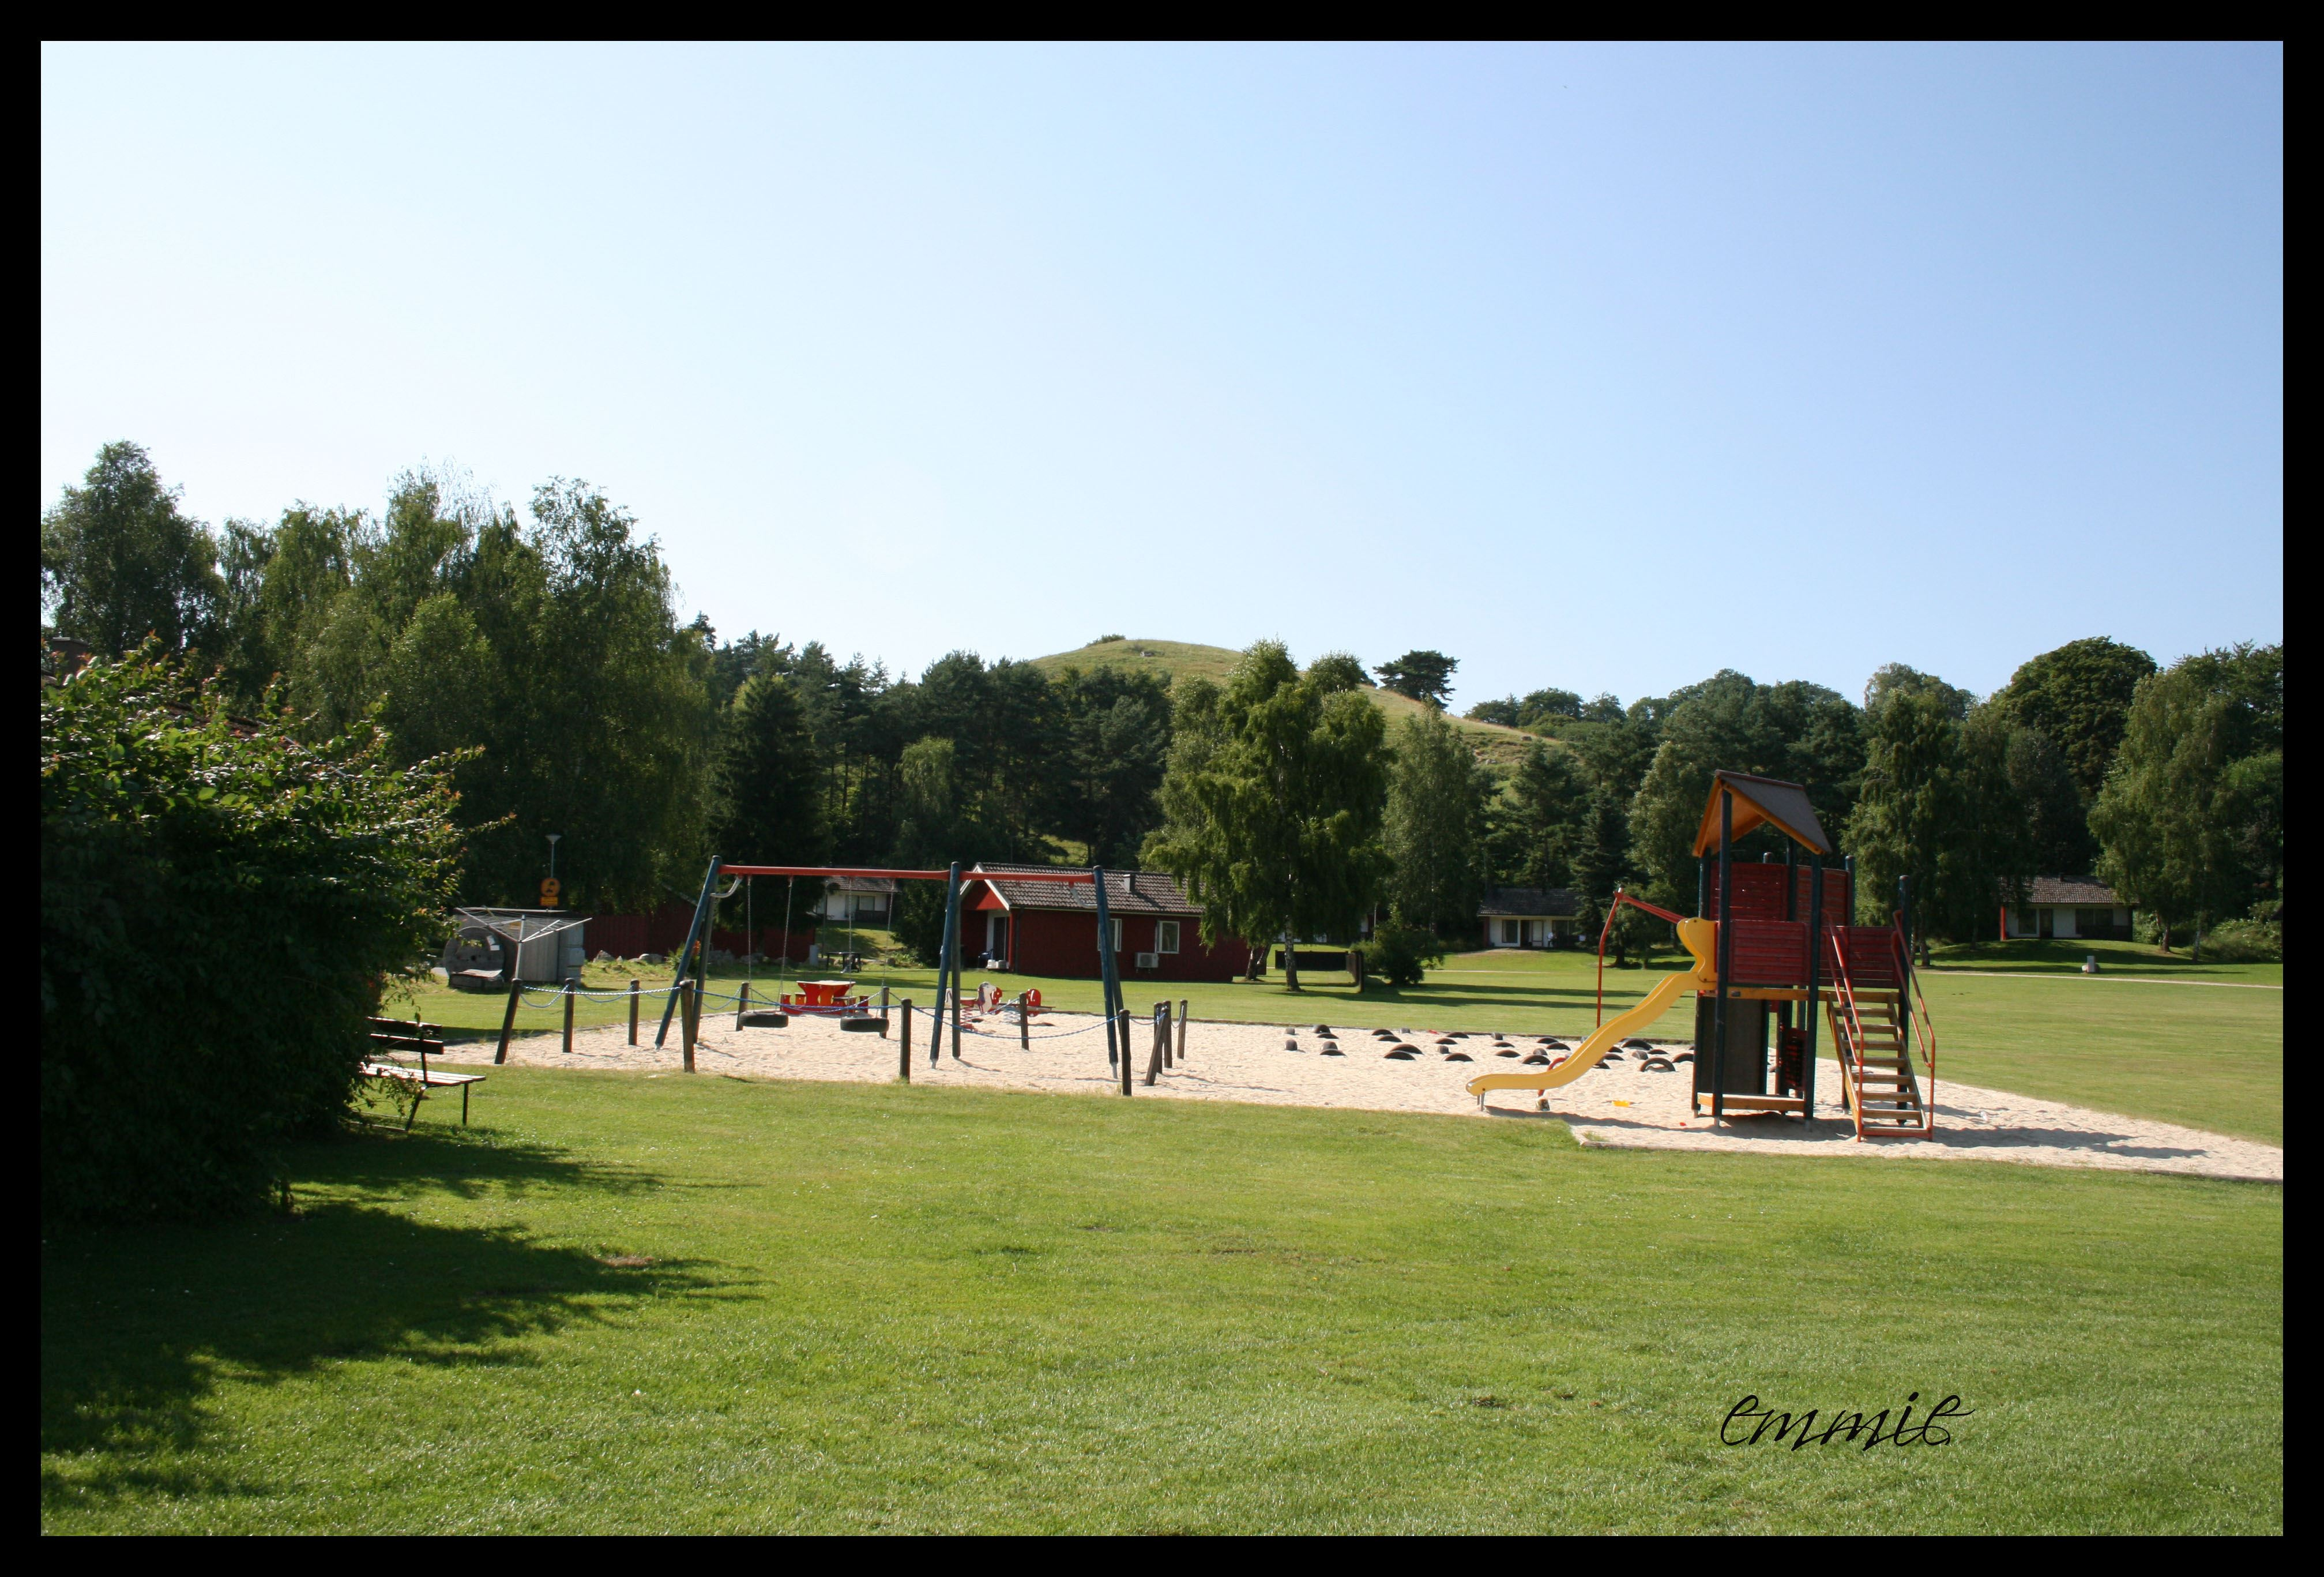 Degeberga Stugby/Vandrarhem